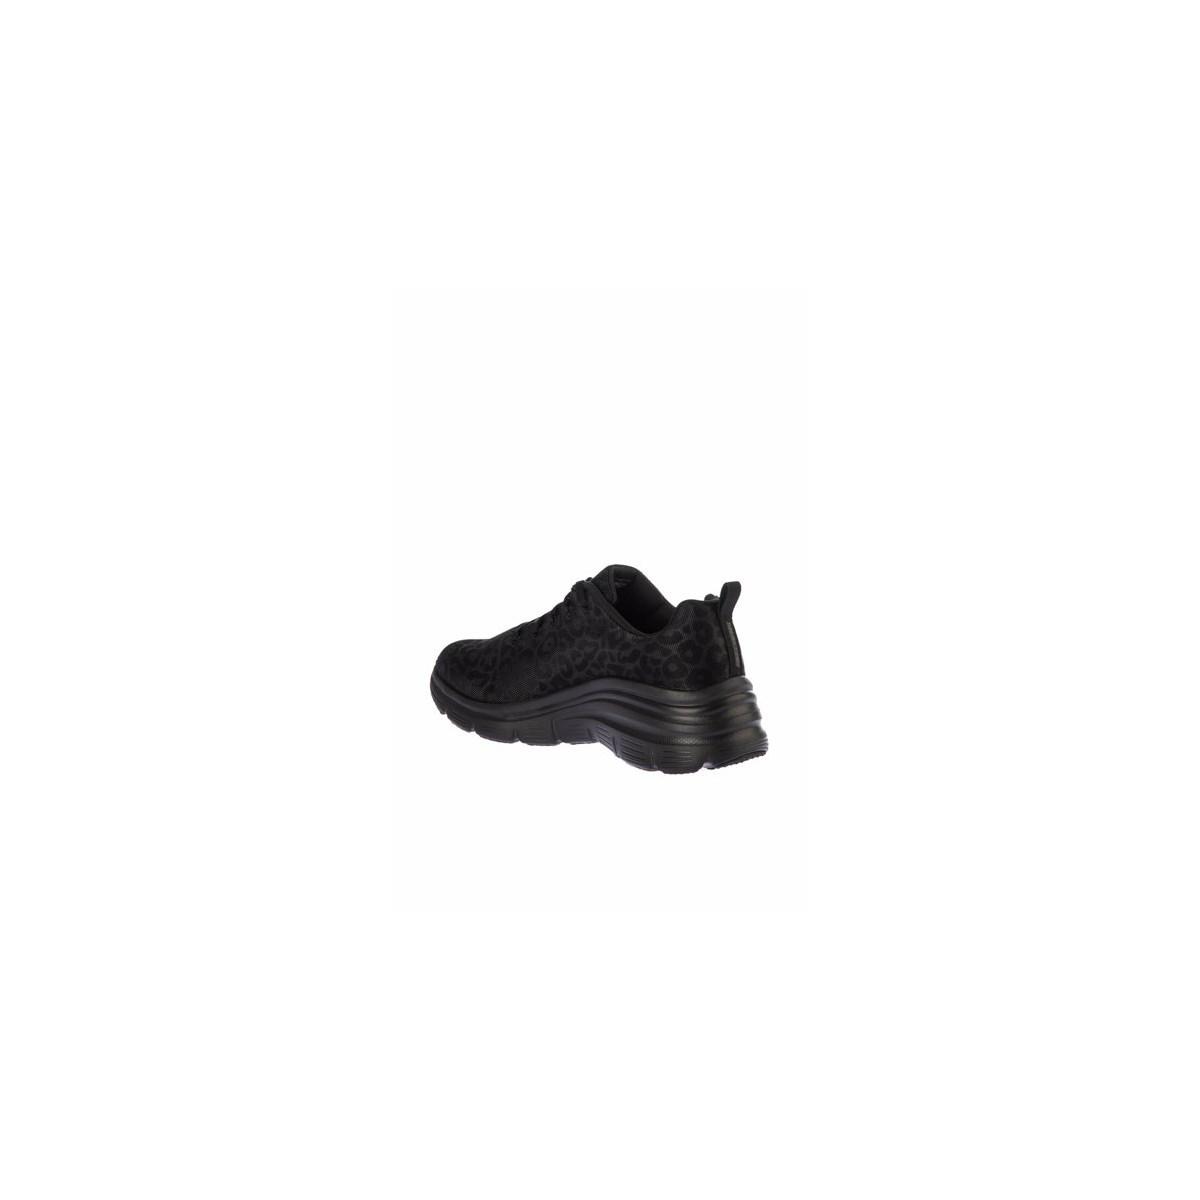 Fashion Fit Kadın Siyah Spor Ayakkabı